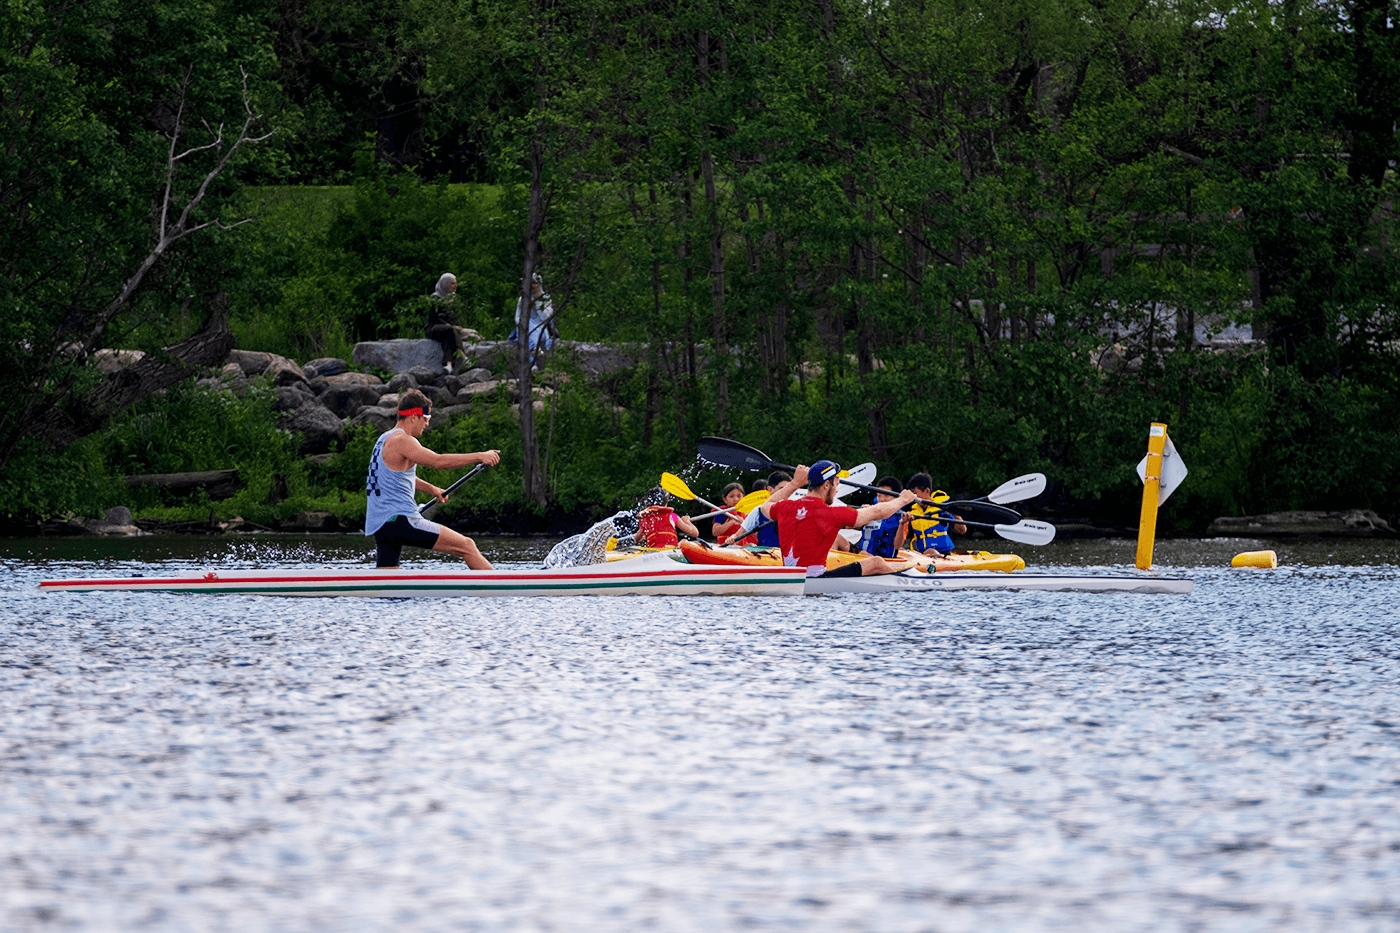 Roland Varga - an Olympic send-off from RHCC 8